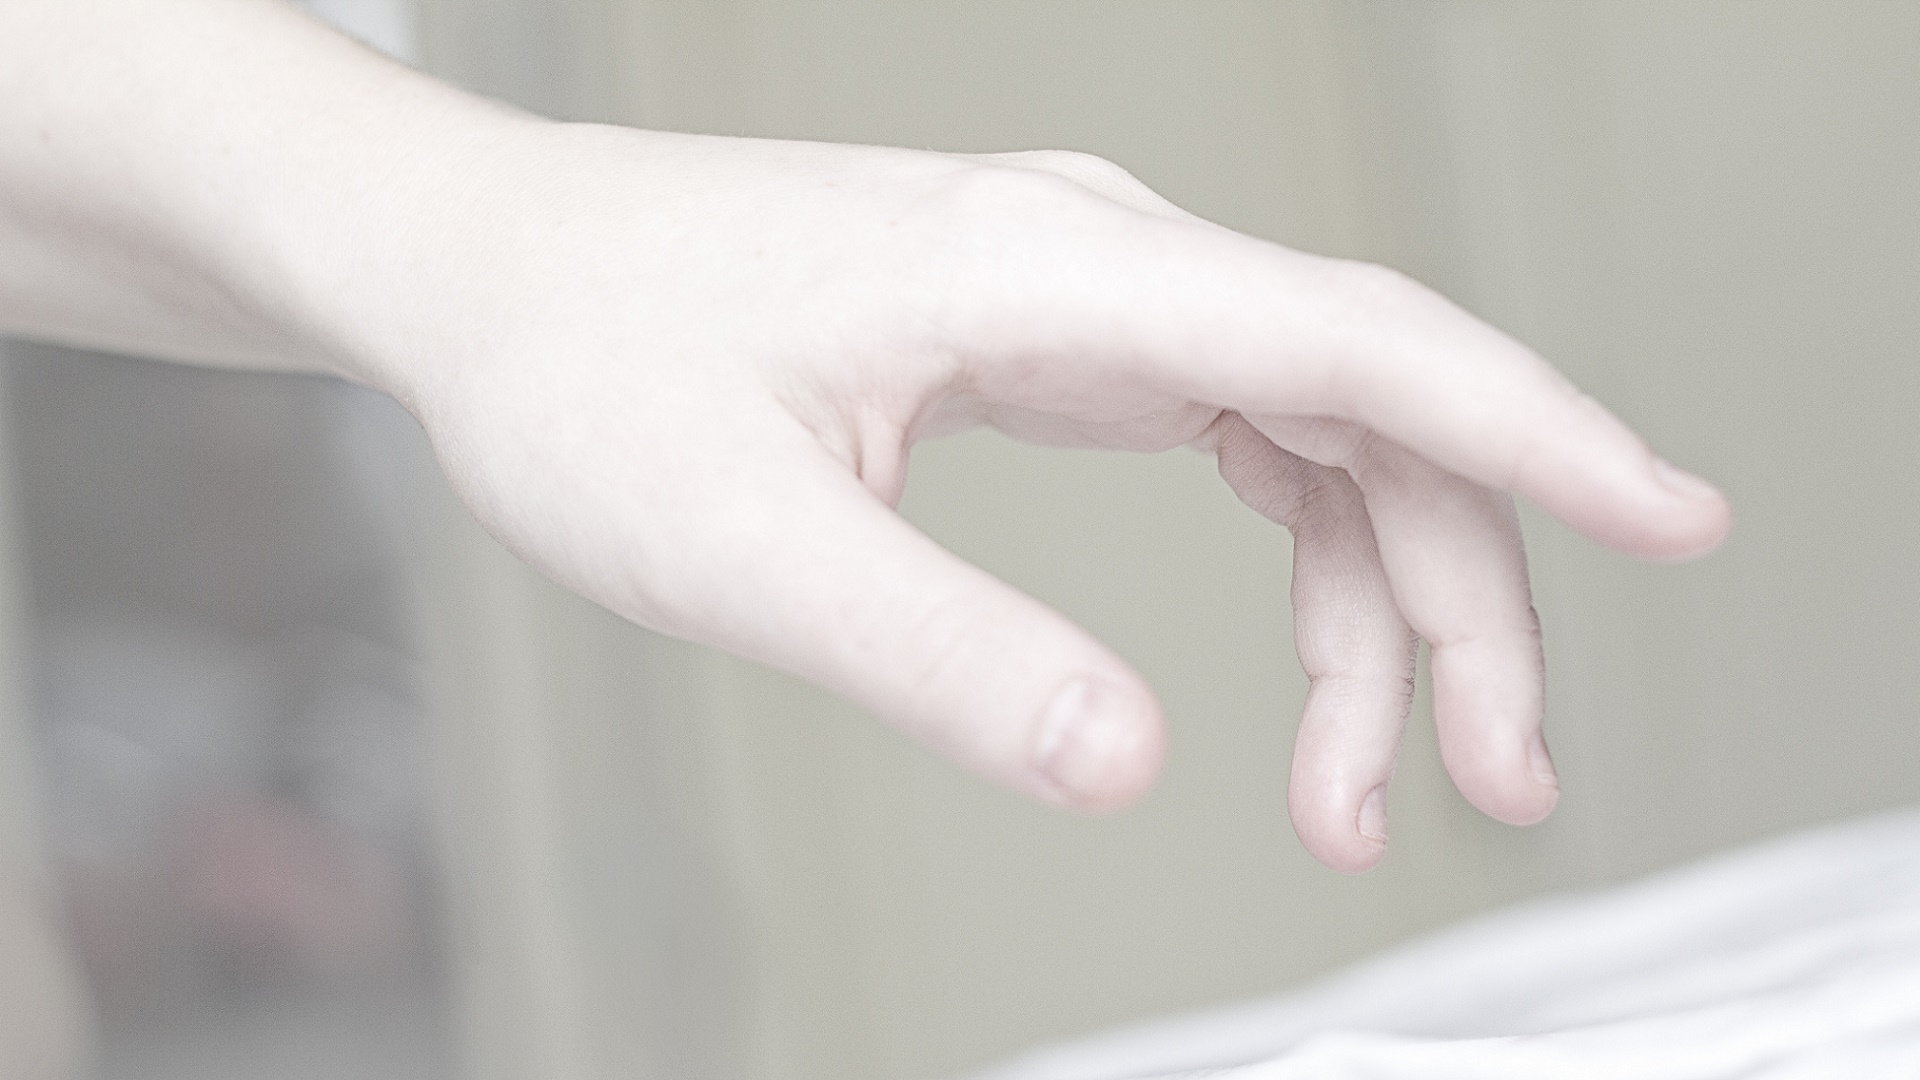 Esta piel artificial monitoriza los niveles de estrés